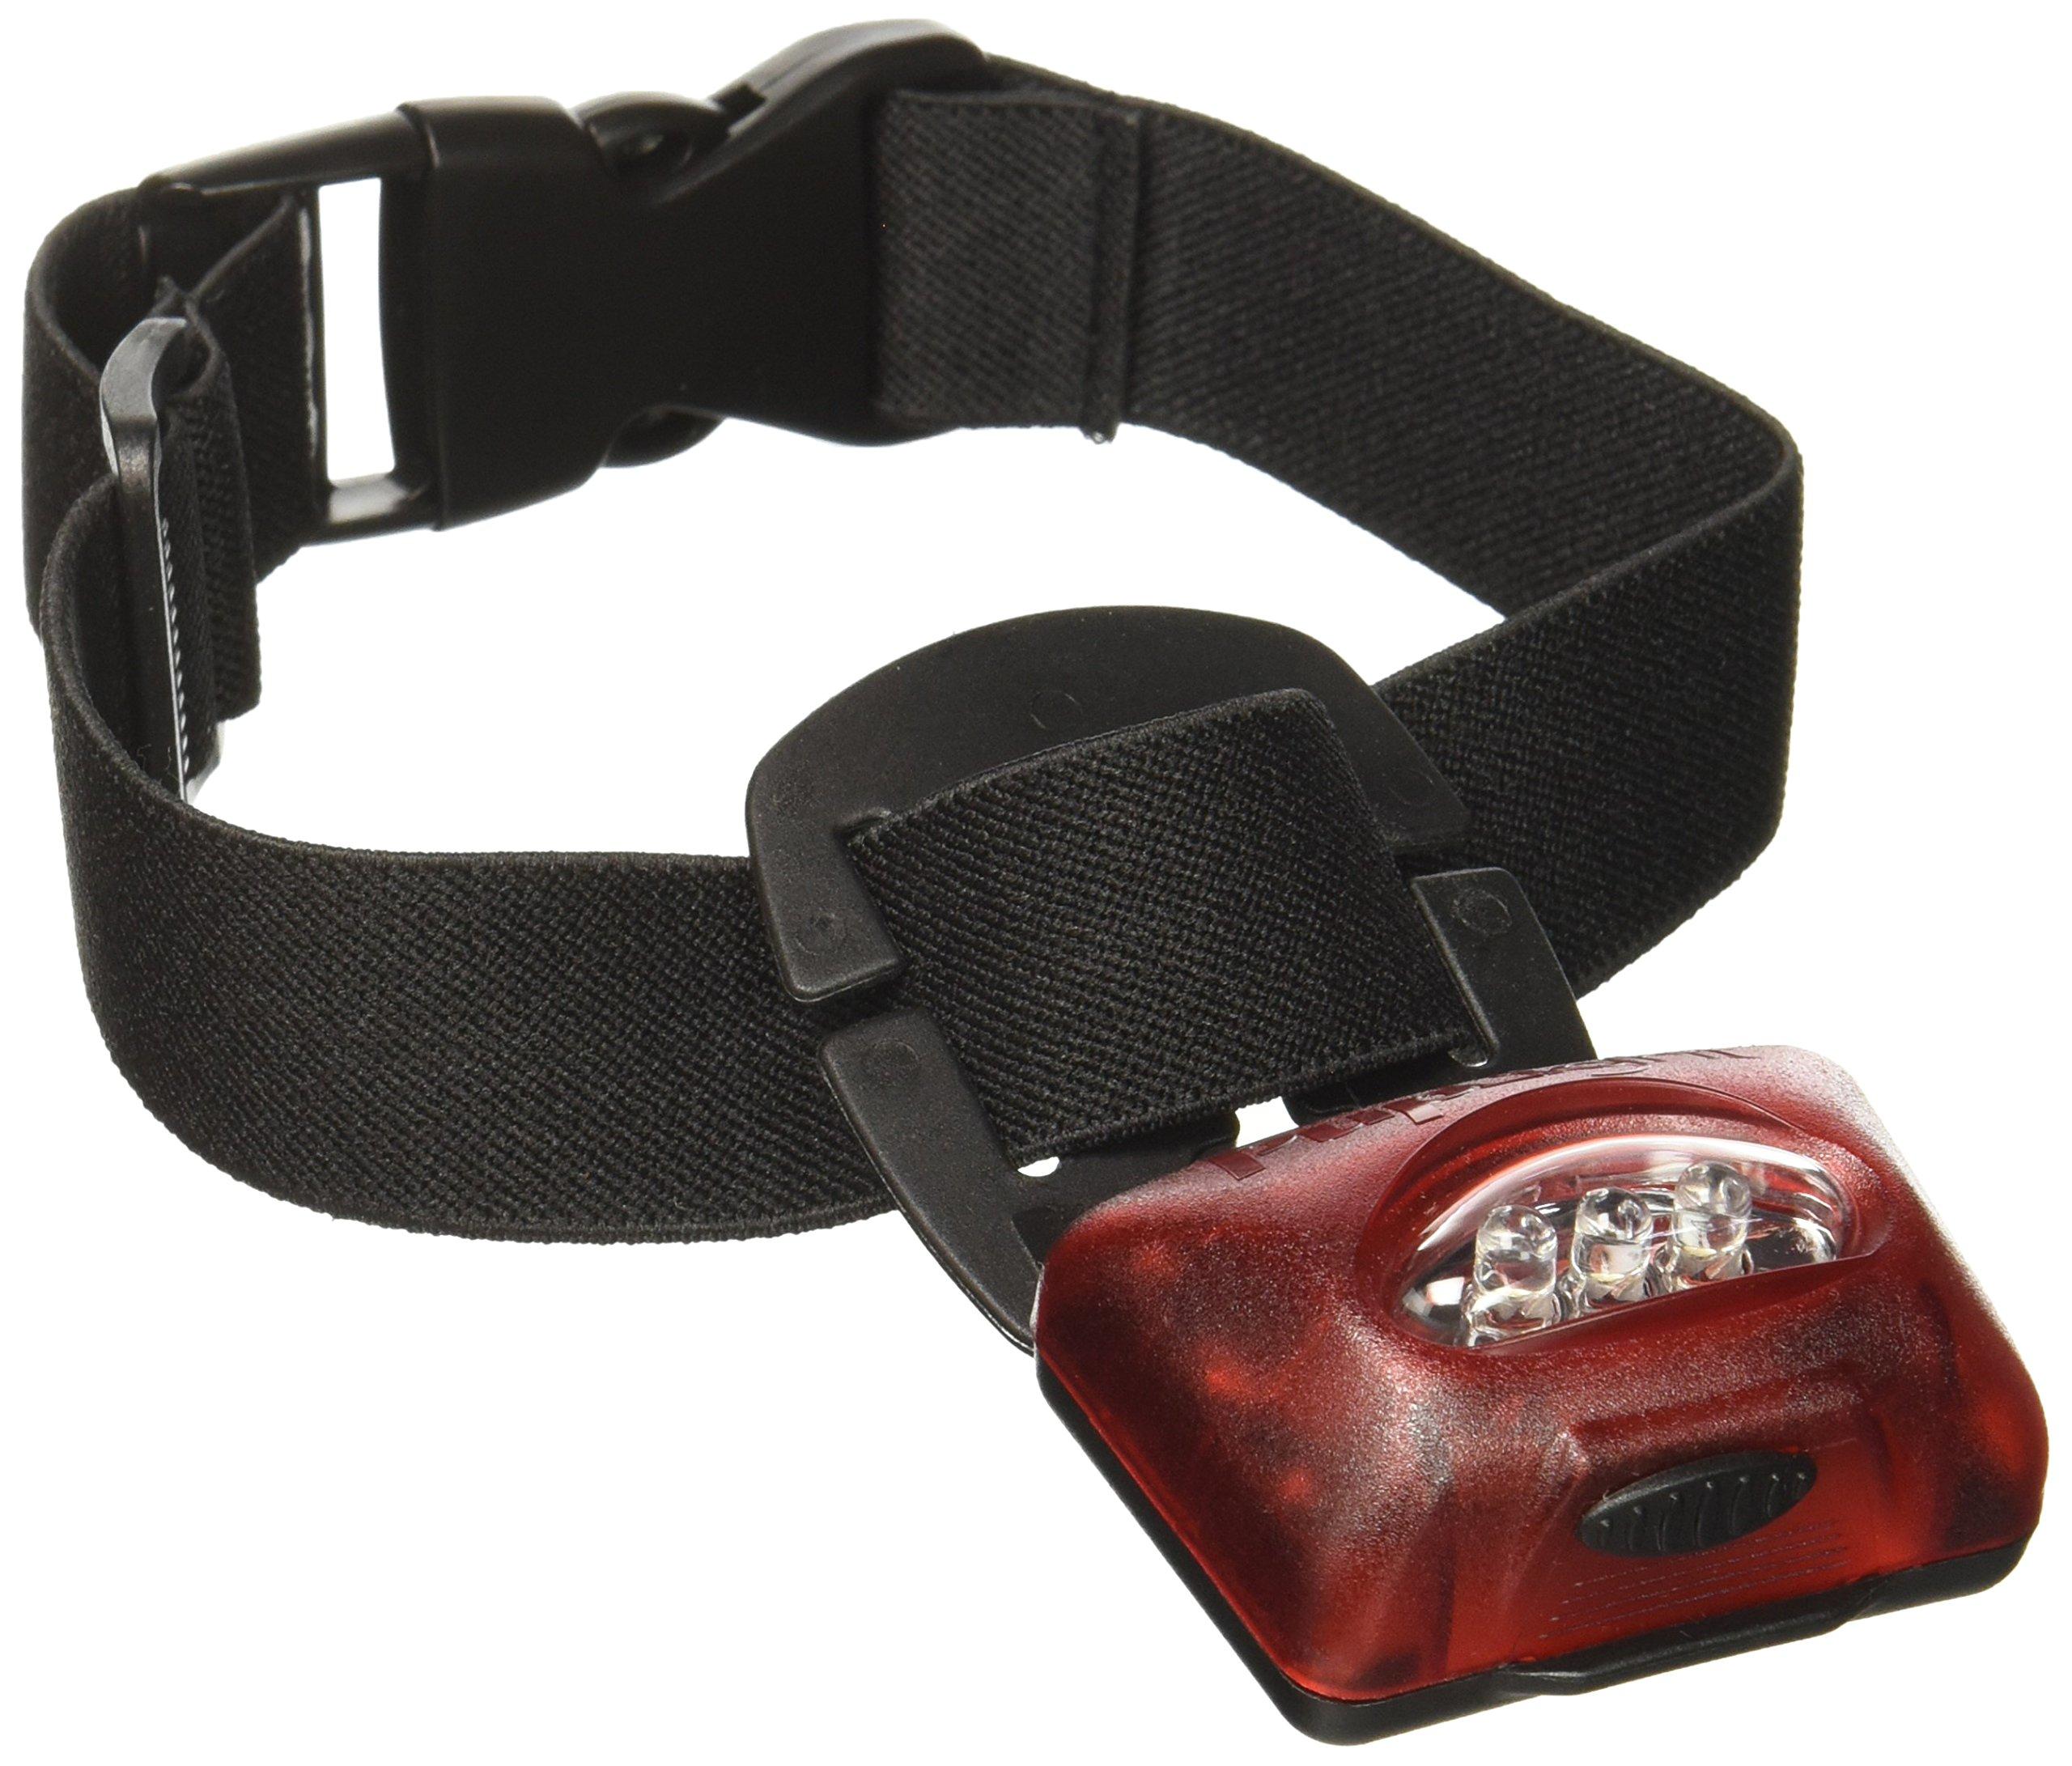 PupLight Dog Safety Light, Red by PupLight (Image #4)